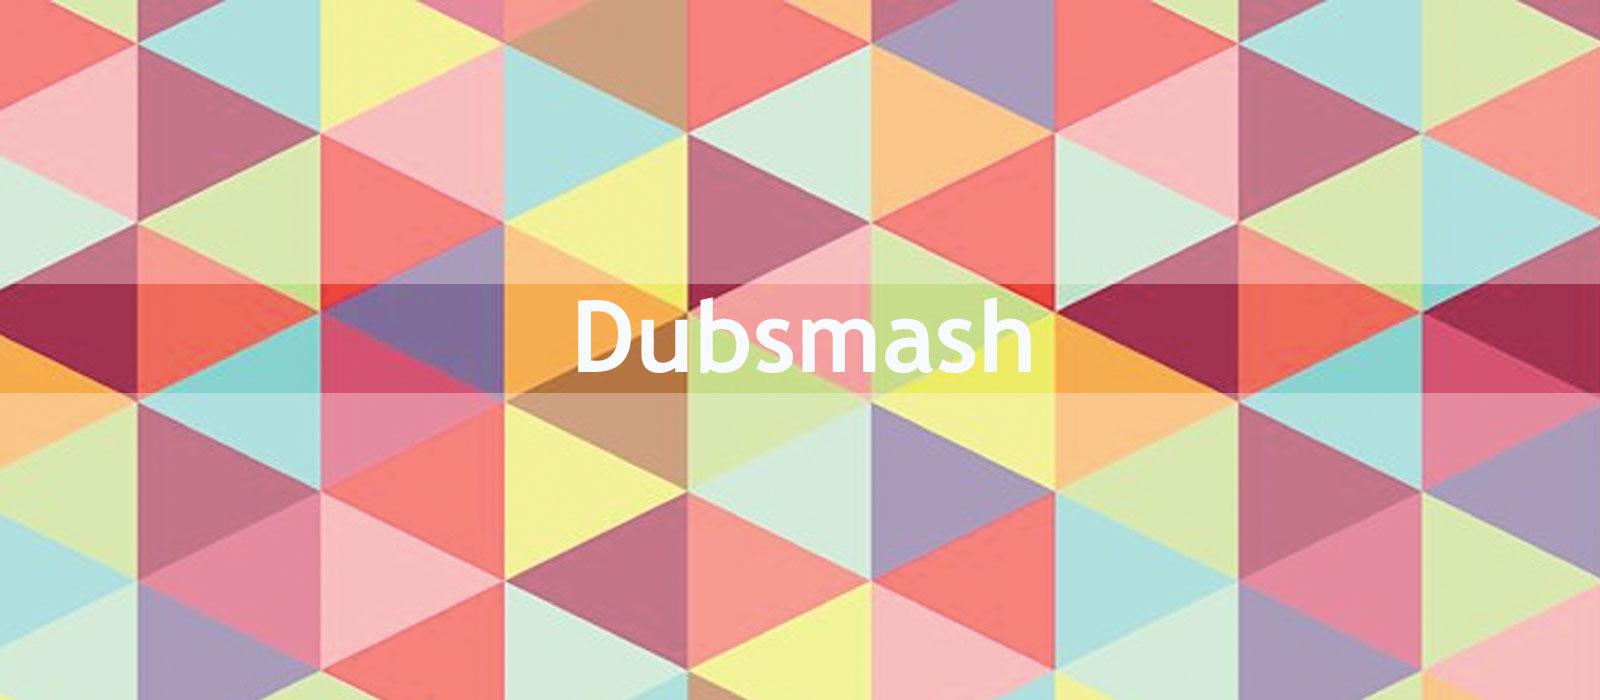 Marketing Business Case Study List Business Case Studies Dubsmash A Case Study In Virality